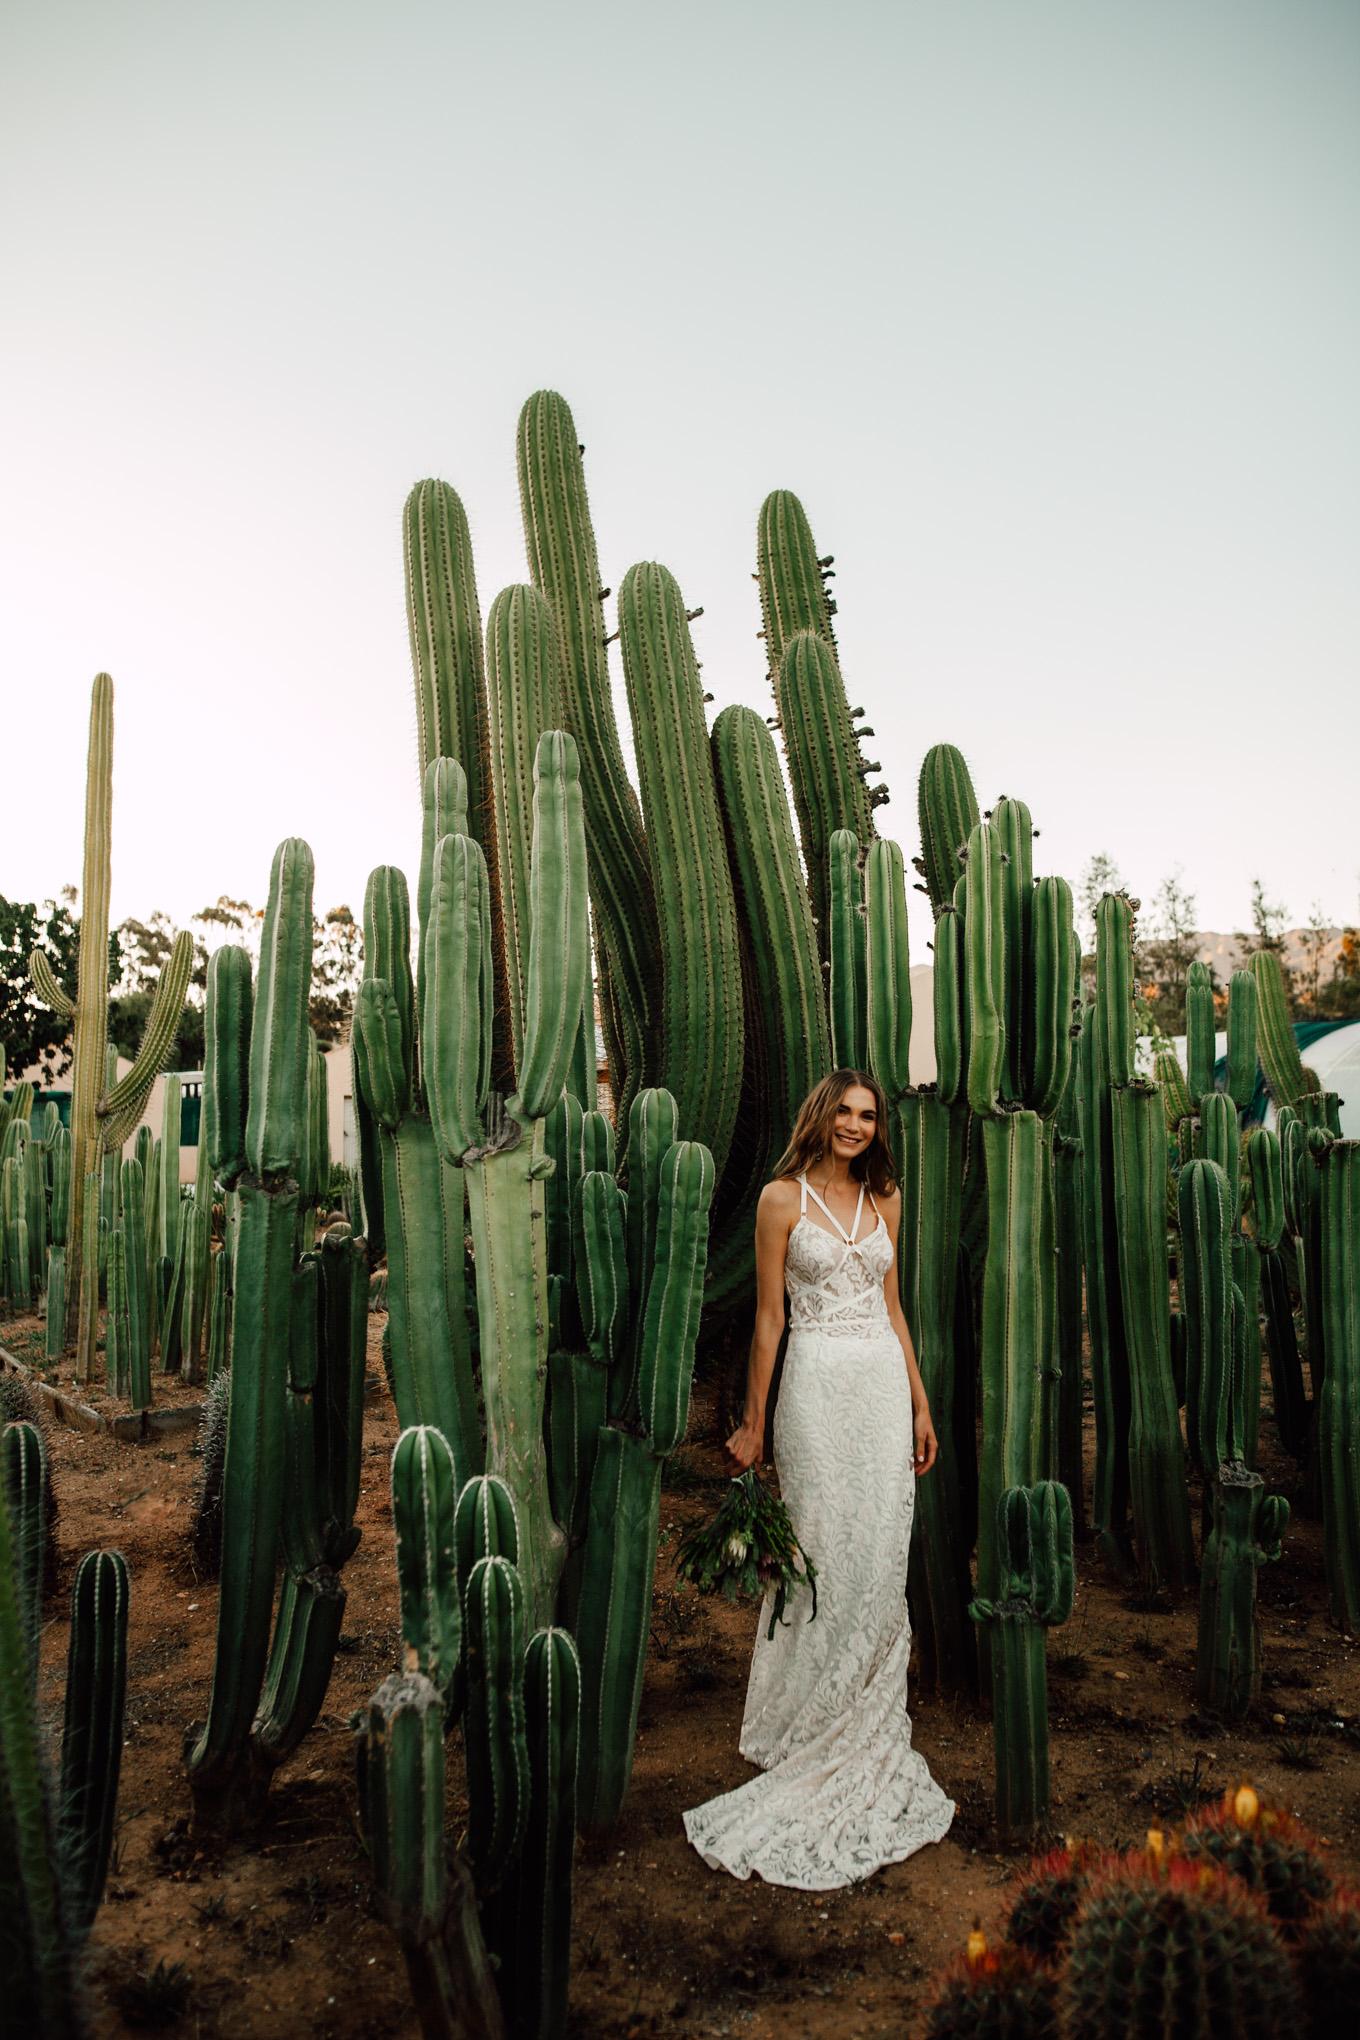 Cape-Town-Pia-Anna-Christian-Wedding-Photography-South-Africa-Bride-Cactus-14.jpg